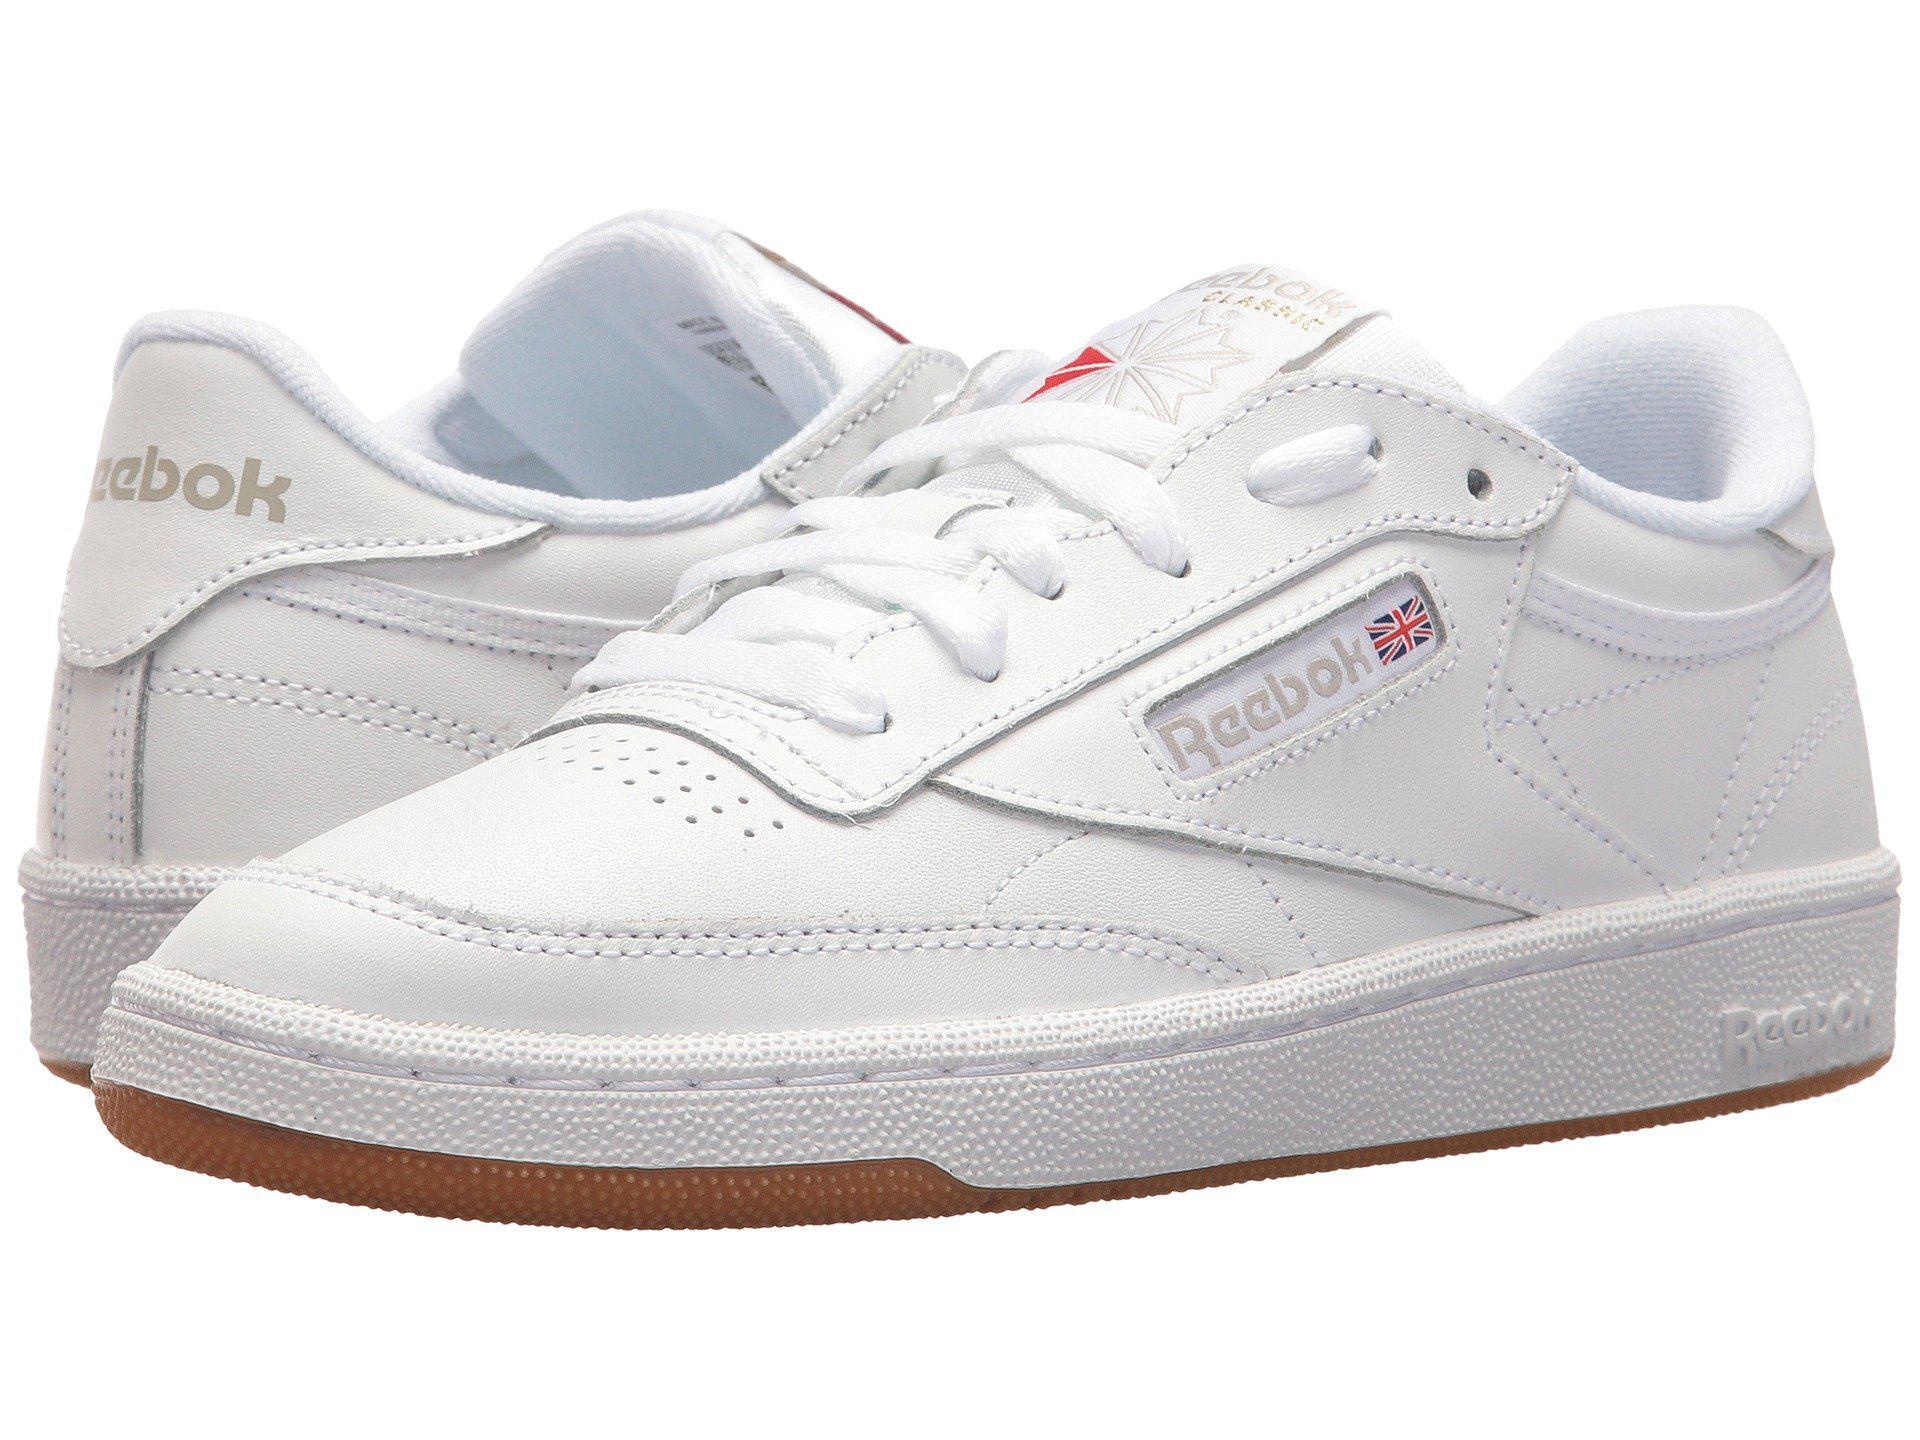 45131db4123a Lyst - Reebok Club C 85 (white light Grey gum) Women s Shoes